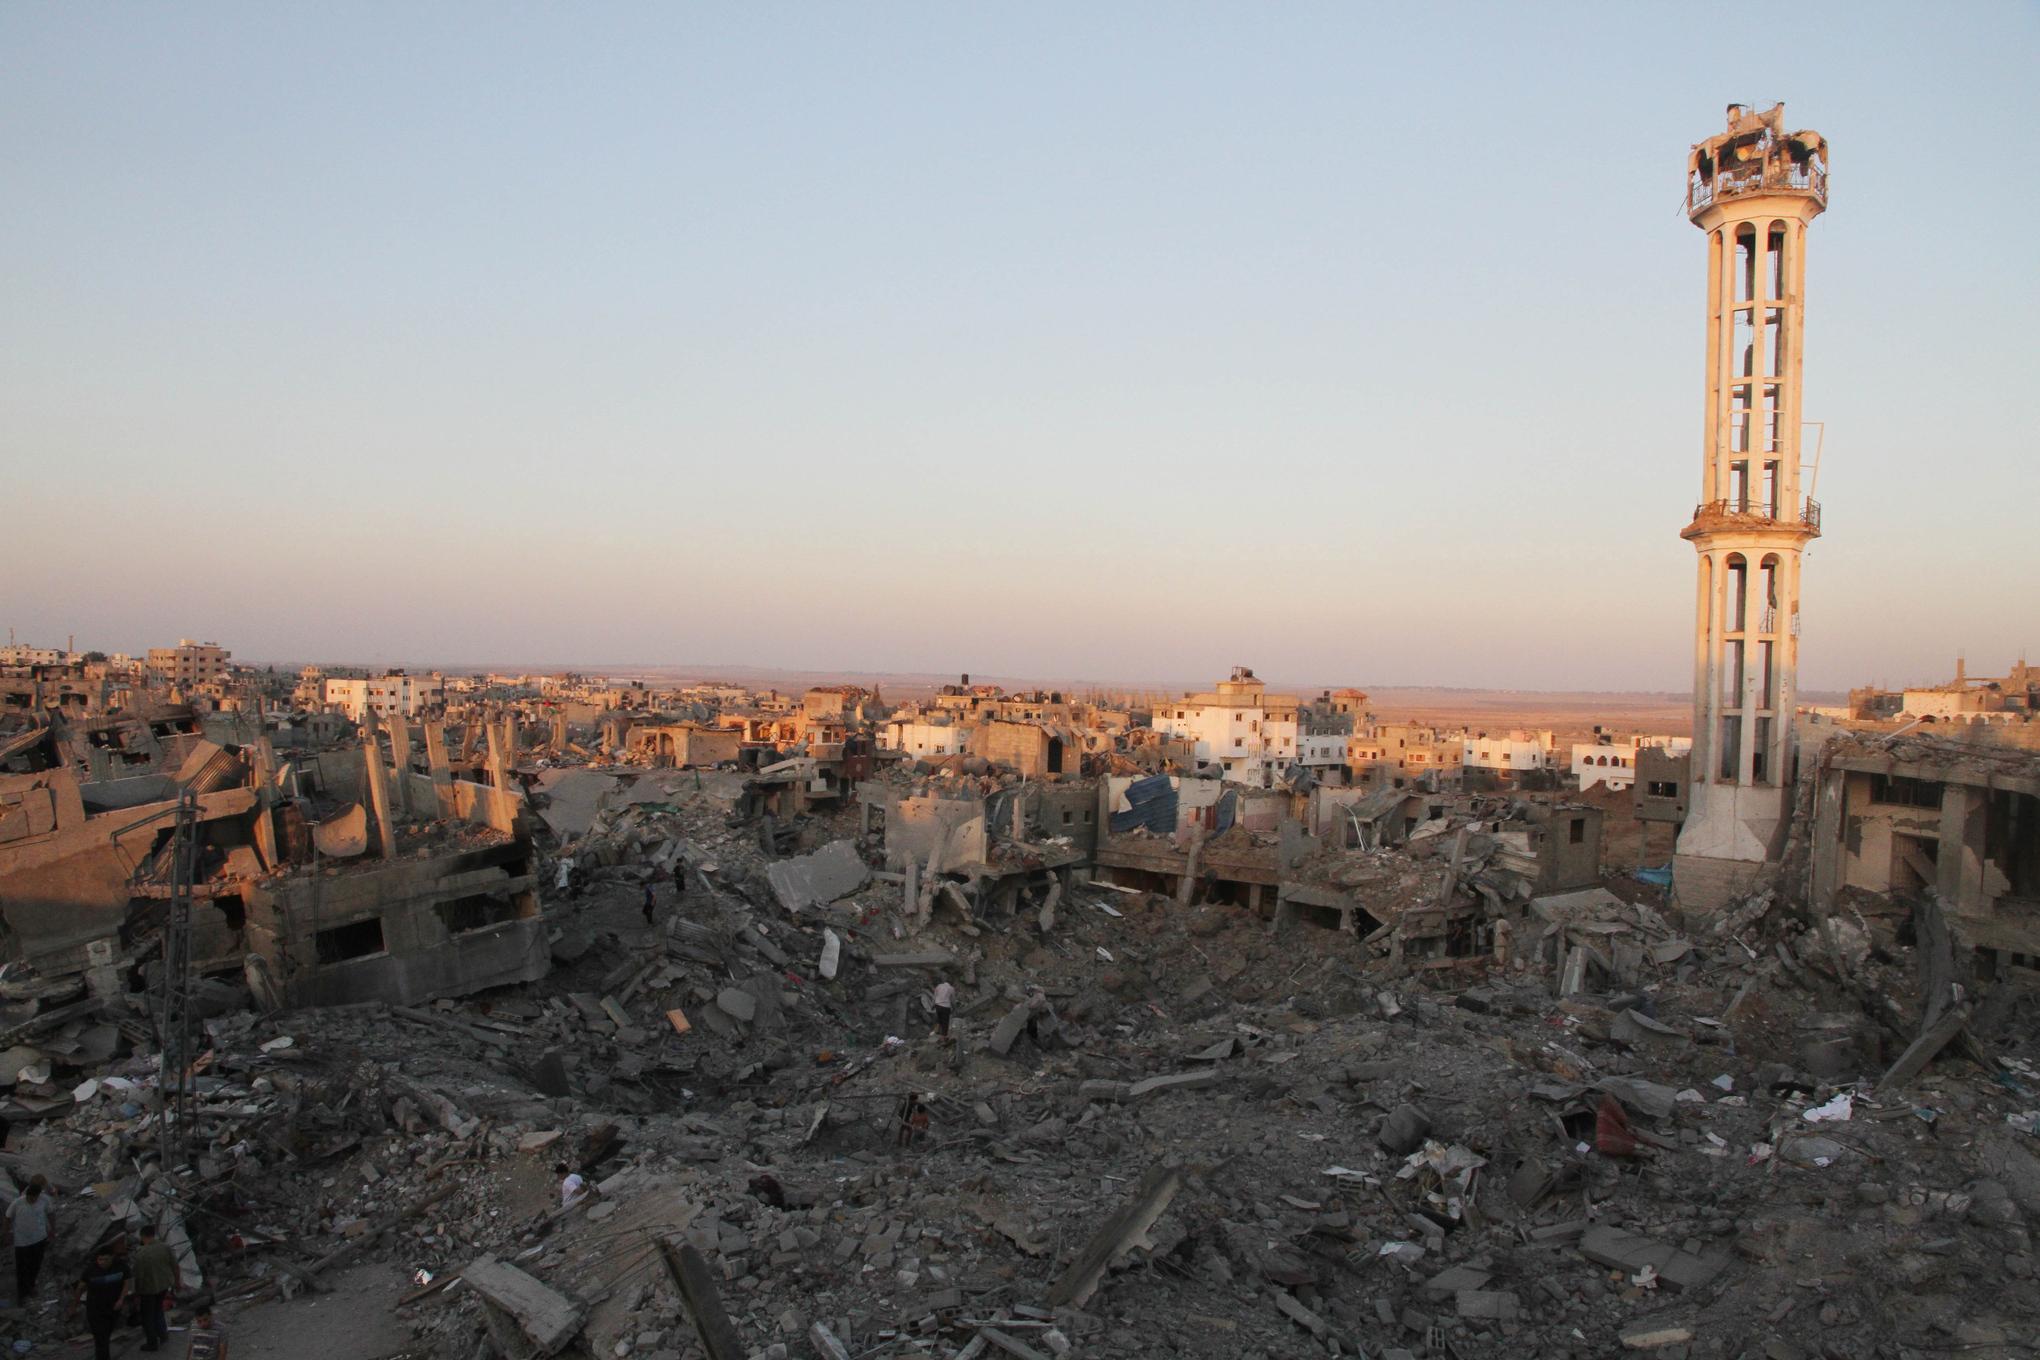 Minaret_in_rubble_of_shujaya_gaza